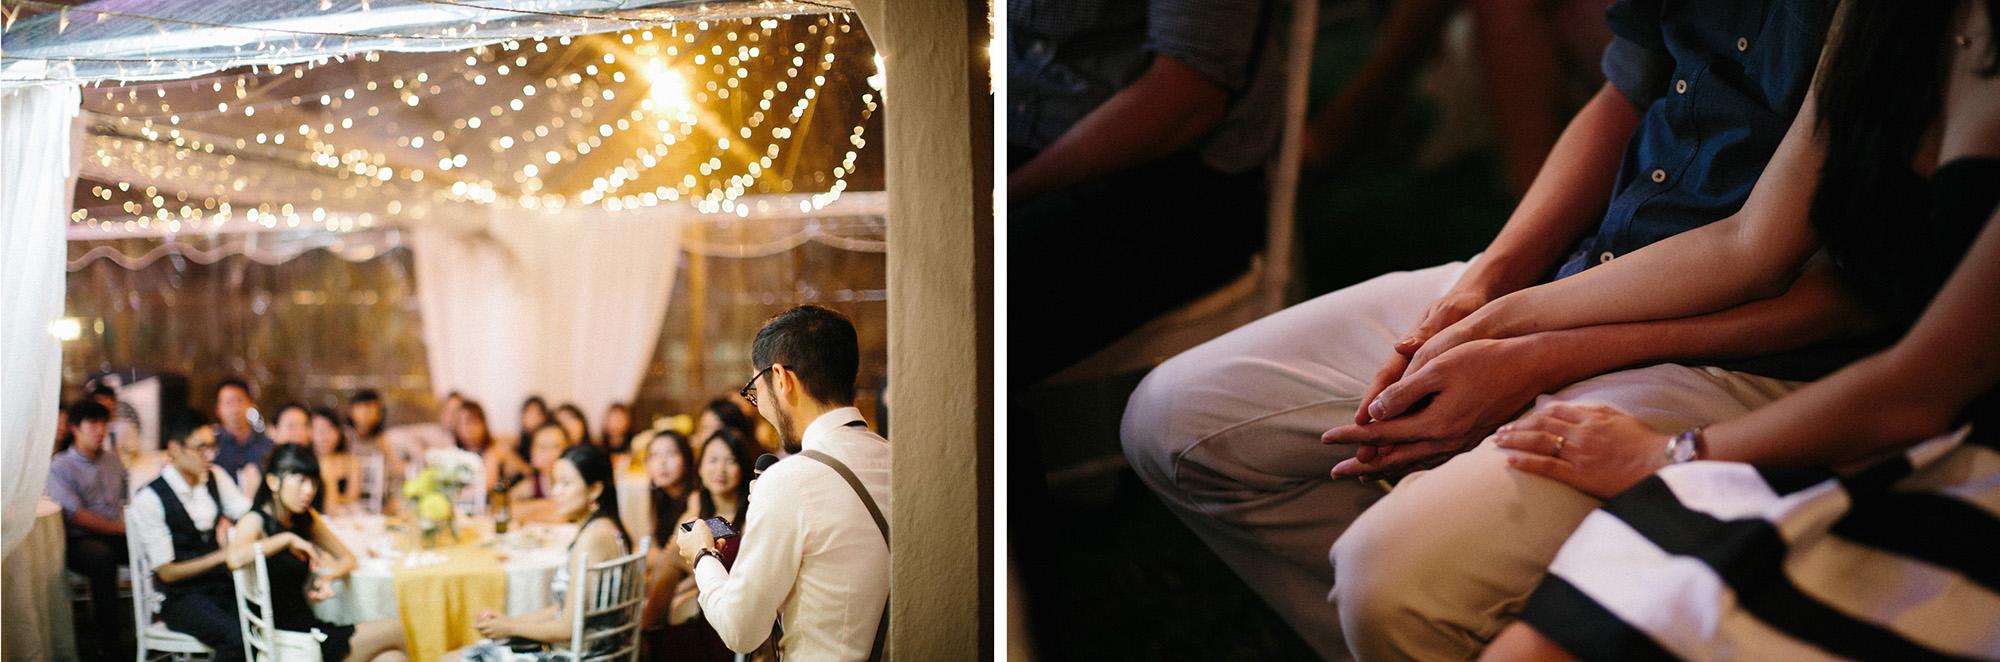 101-hellojanelee-sam grace-malaysia-wedding-day